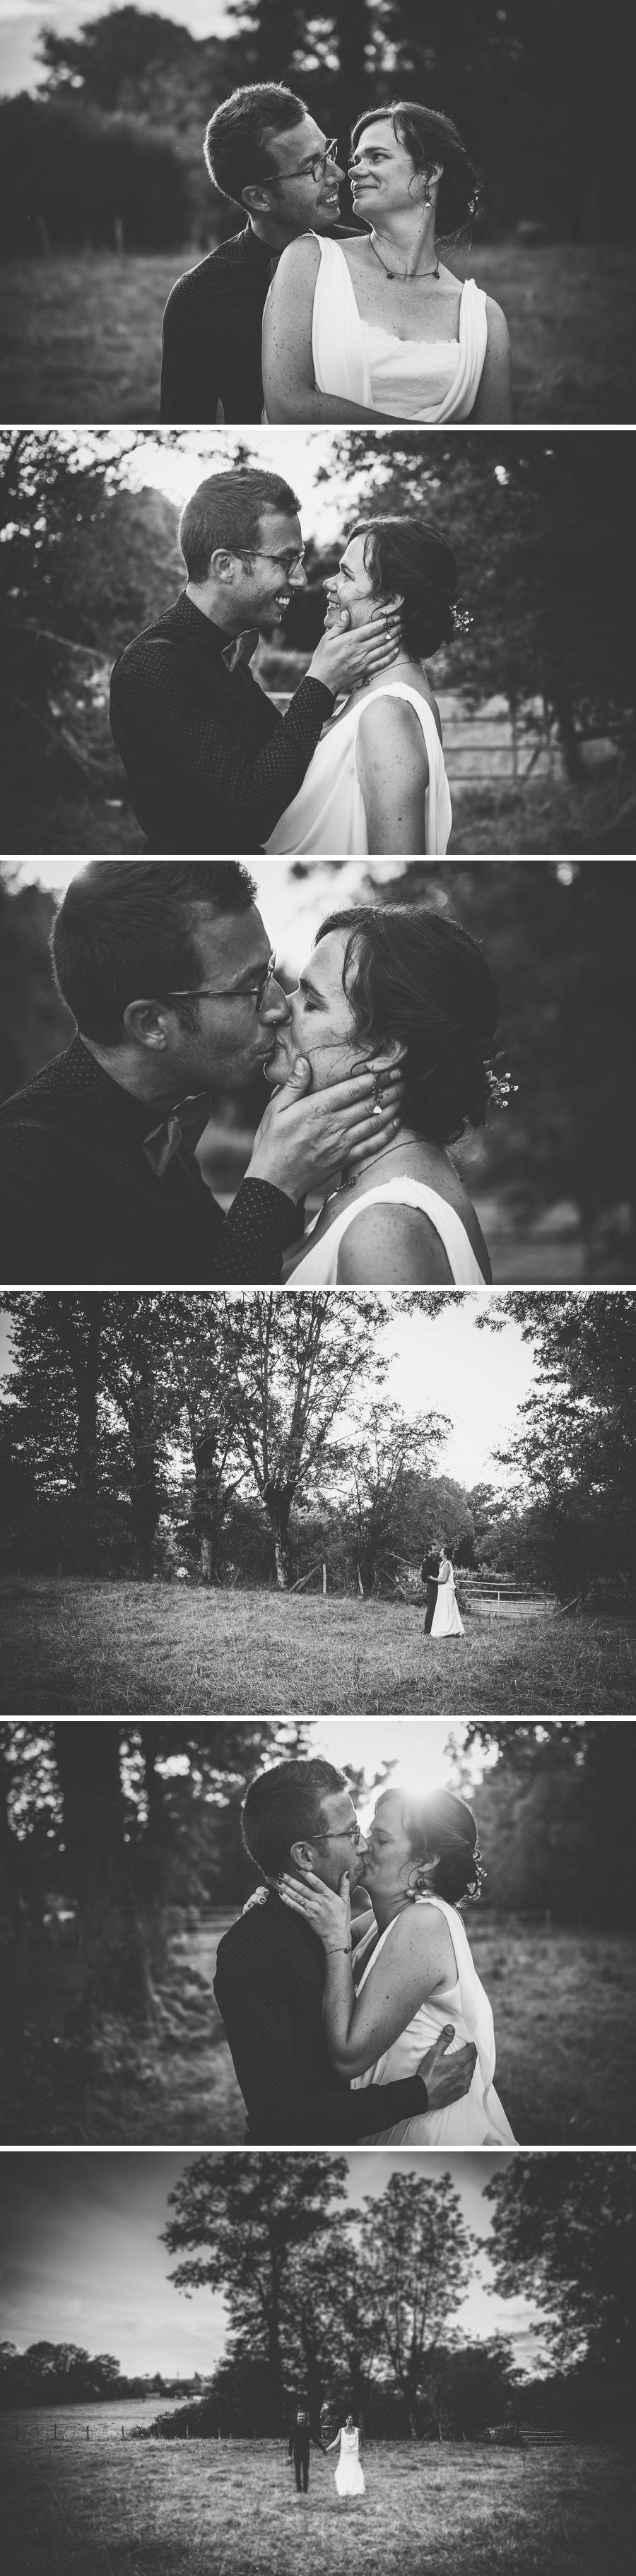 photographe mariage creuse